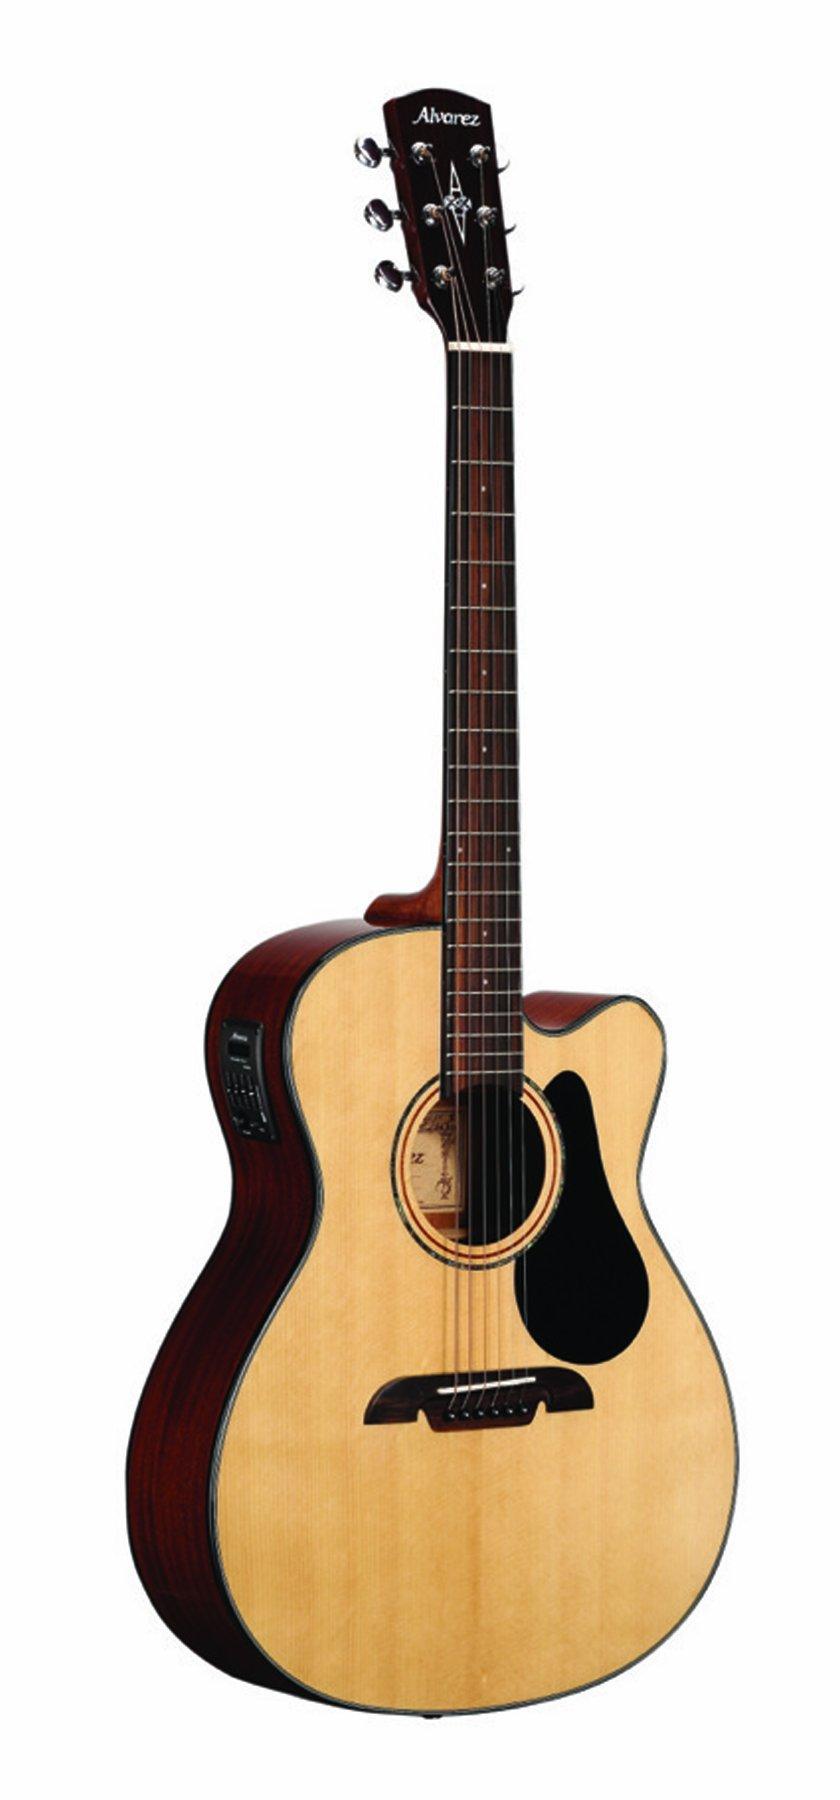 Alvarez AF30CE Artist Series Guitar